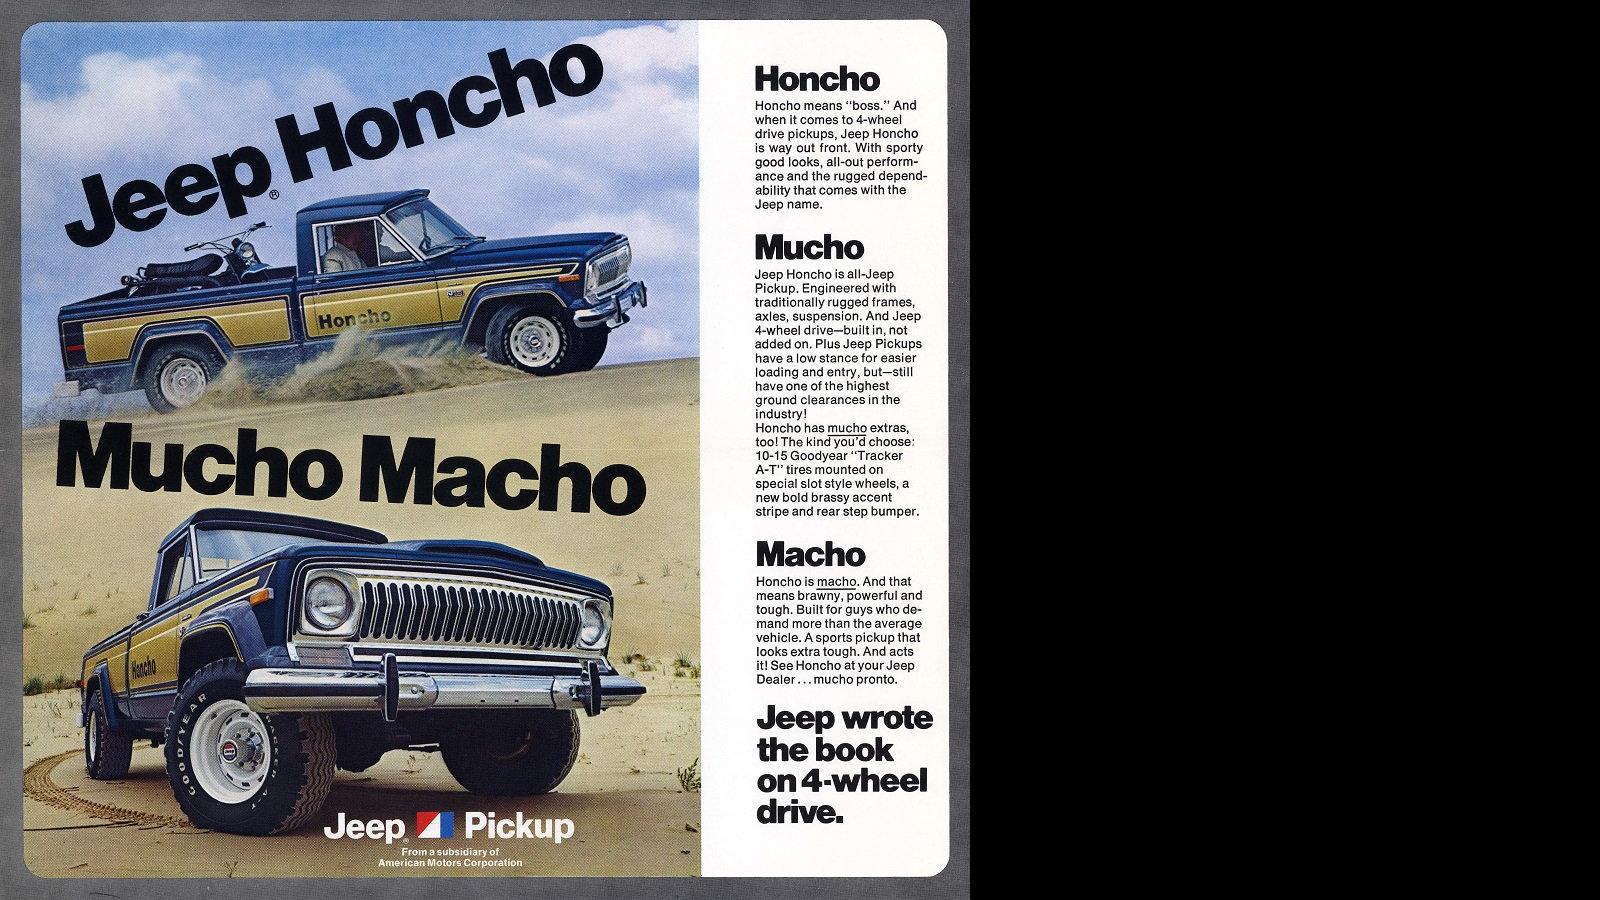 Jeep Honcho - Mucho Macho